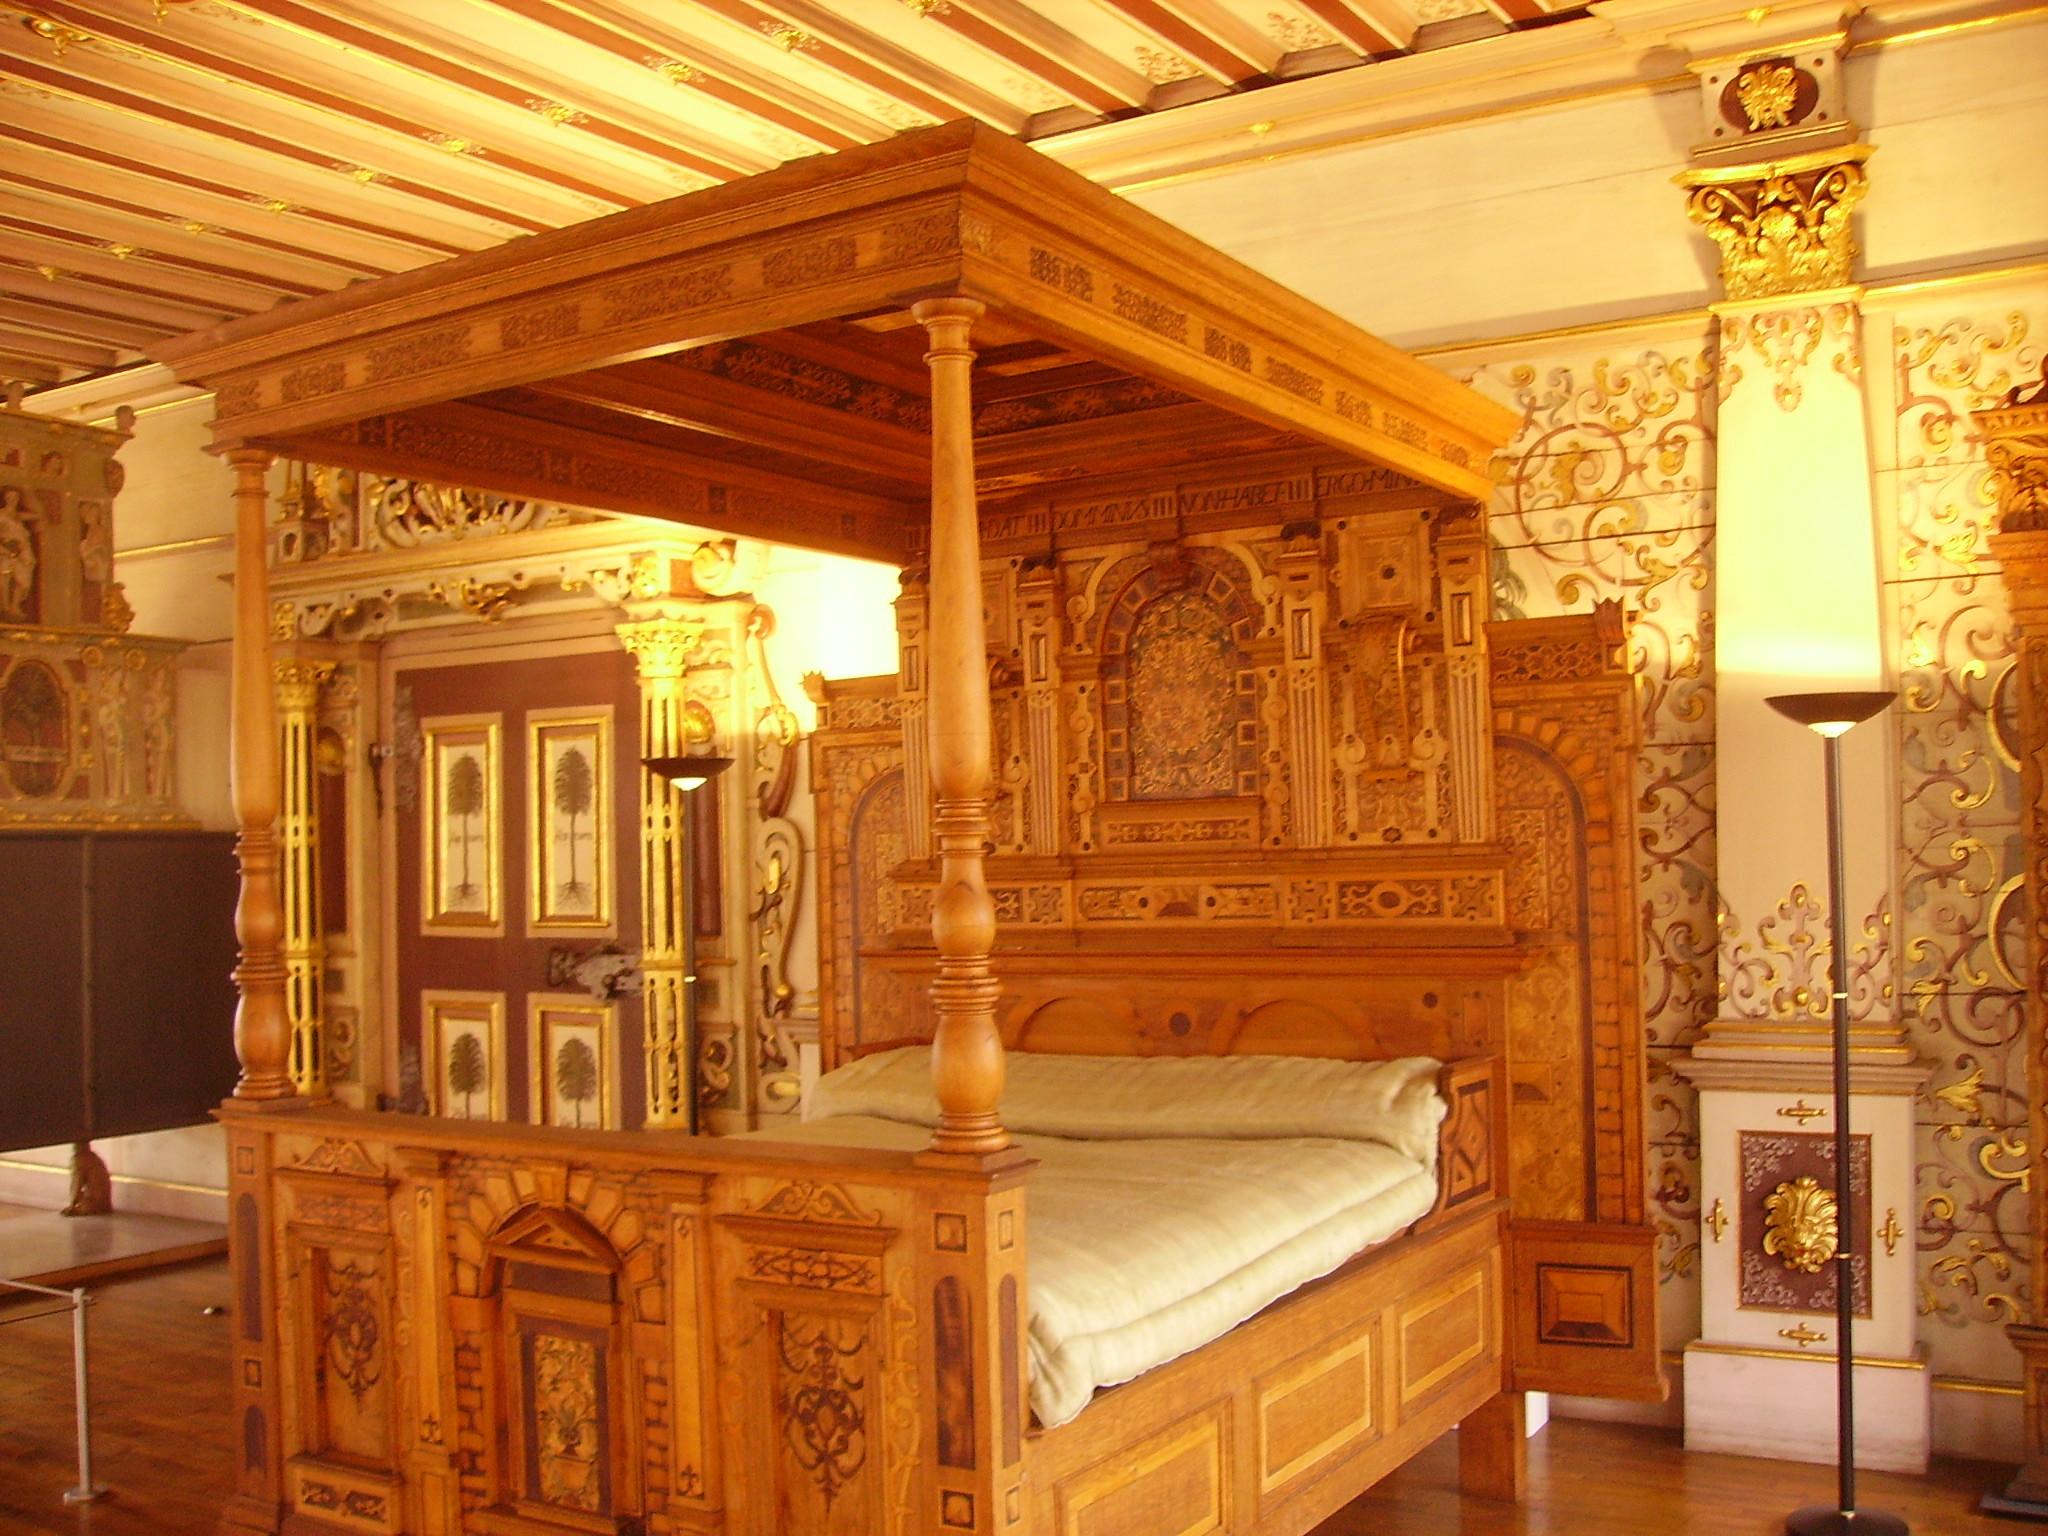 file bad urach schloss innen goldenes zimmer bett wikimedia commons. Black Bedroom Furniture Sets. Home Design Ideas